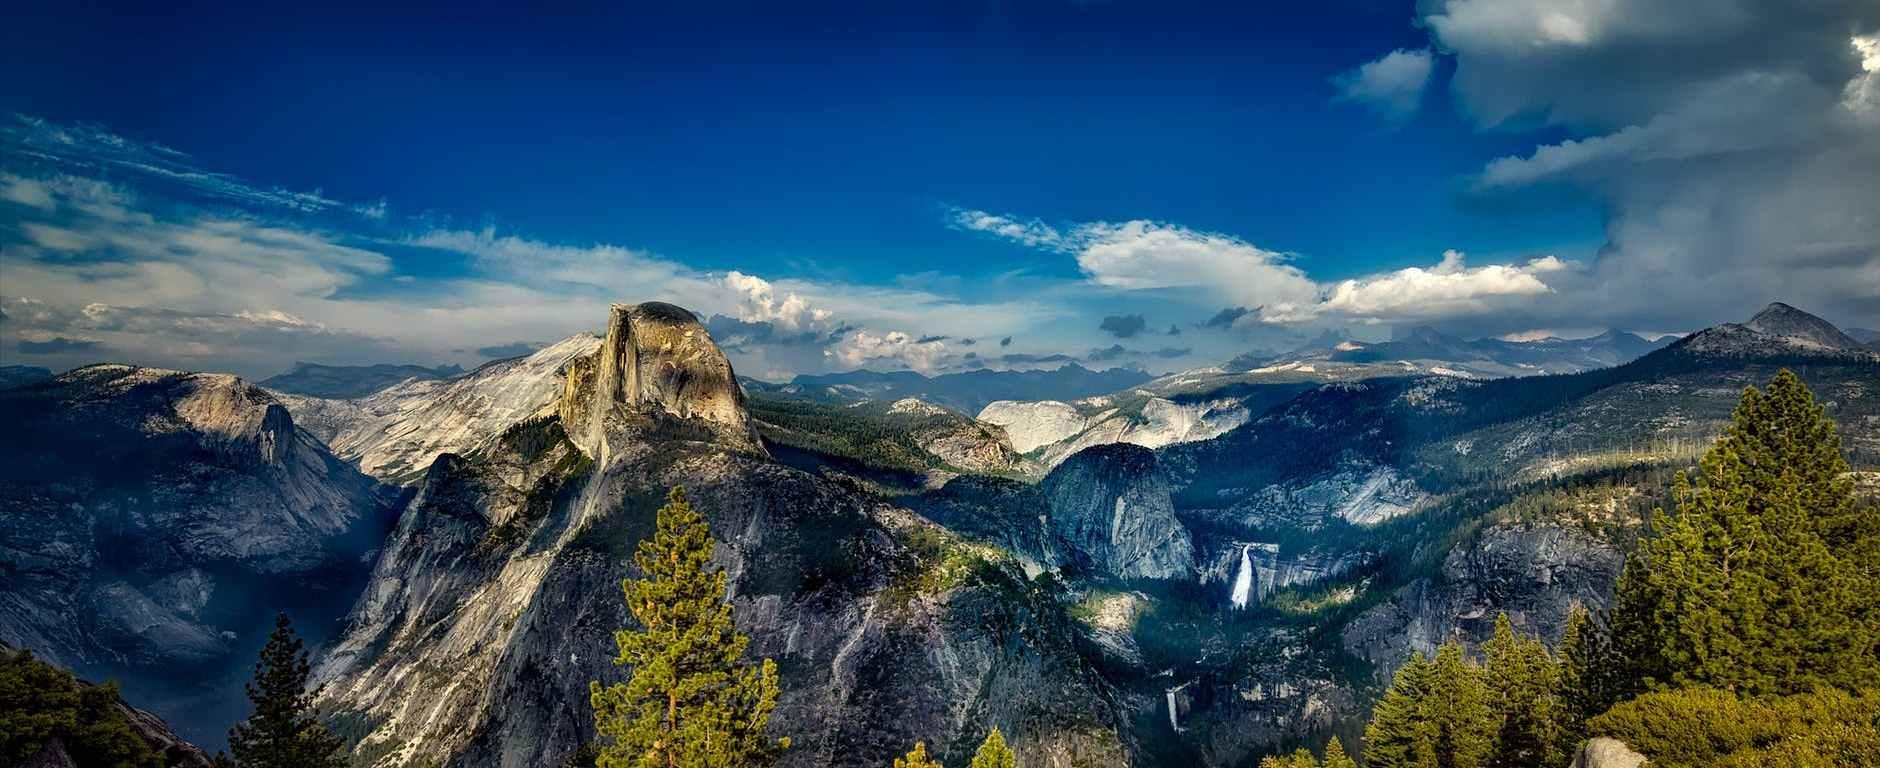 Hiking Yosemite Everything You Need To Know To Hike Half